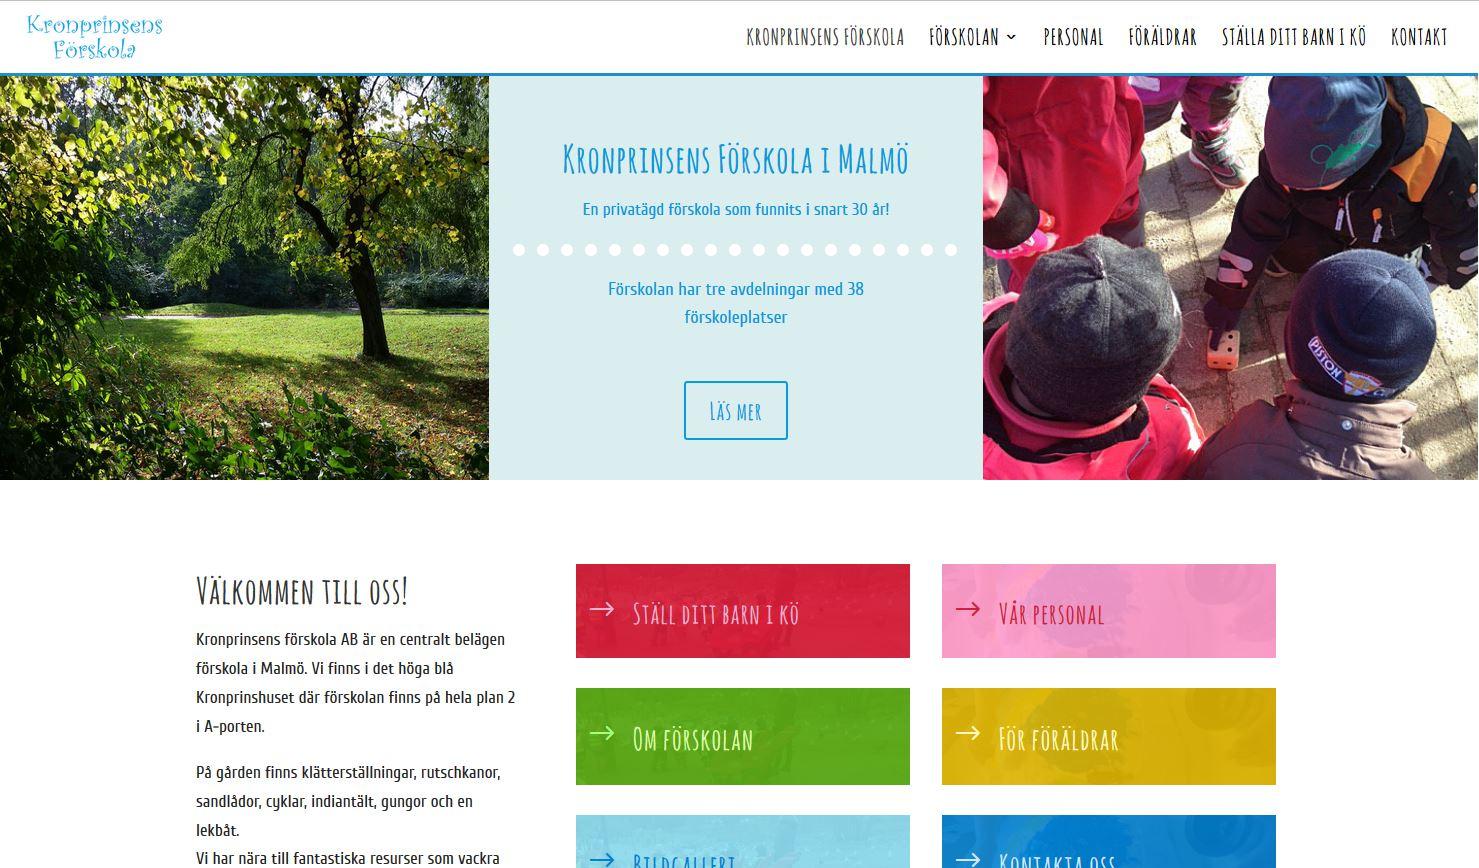 Website for Kronprinsens Förskola in Sweden